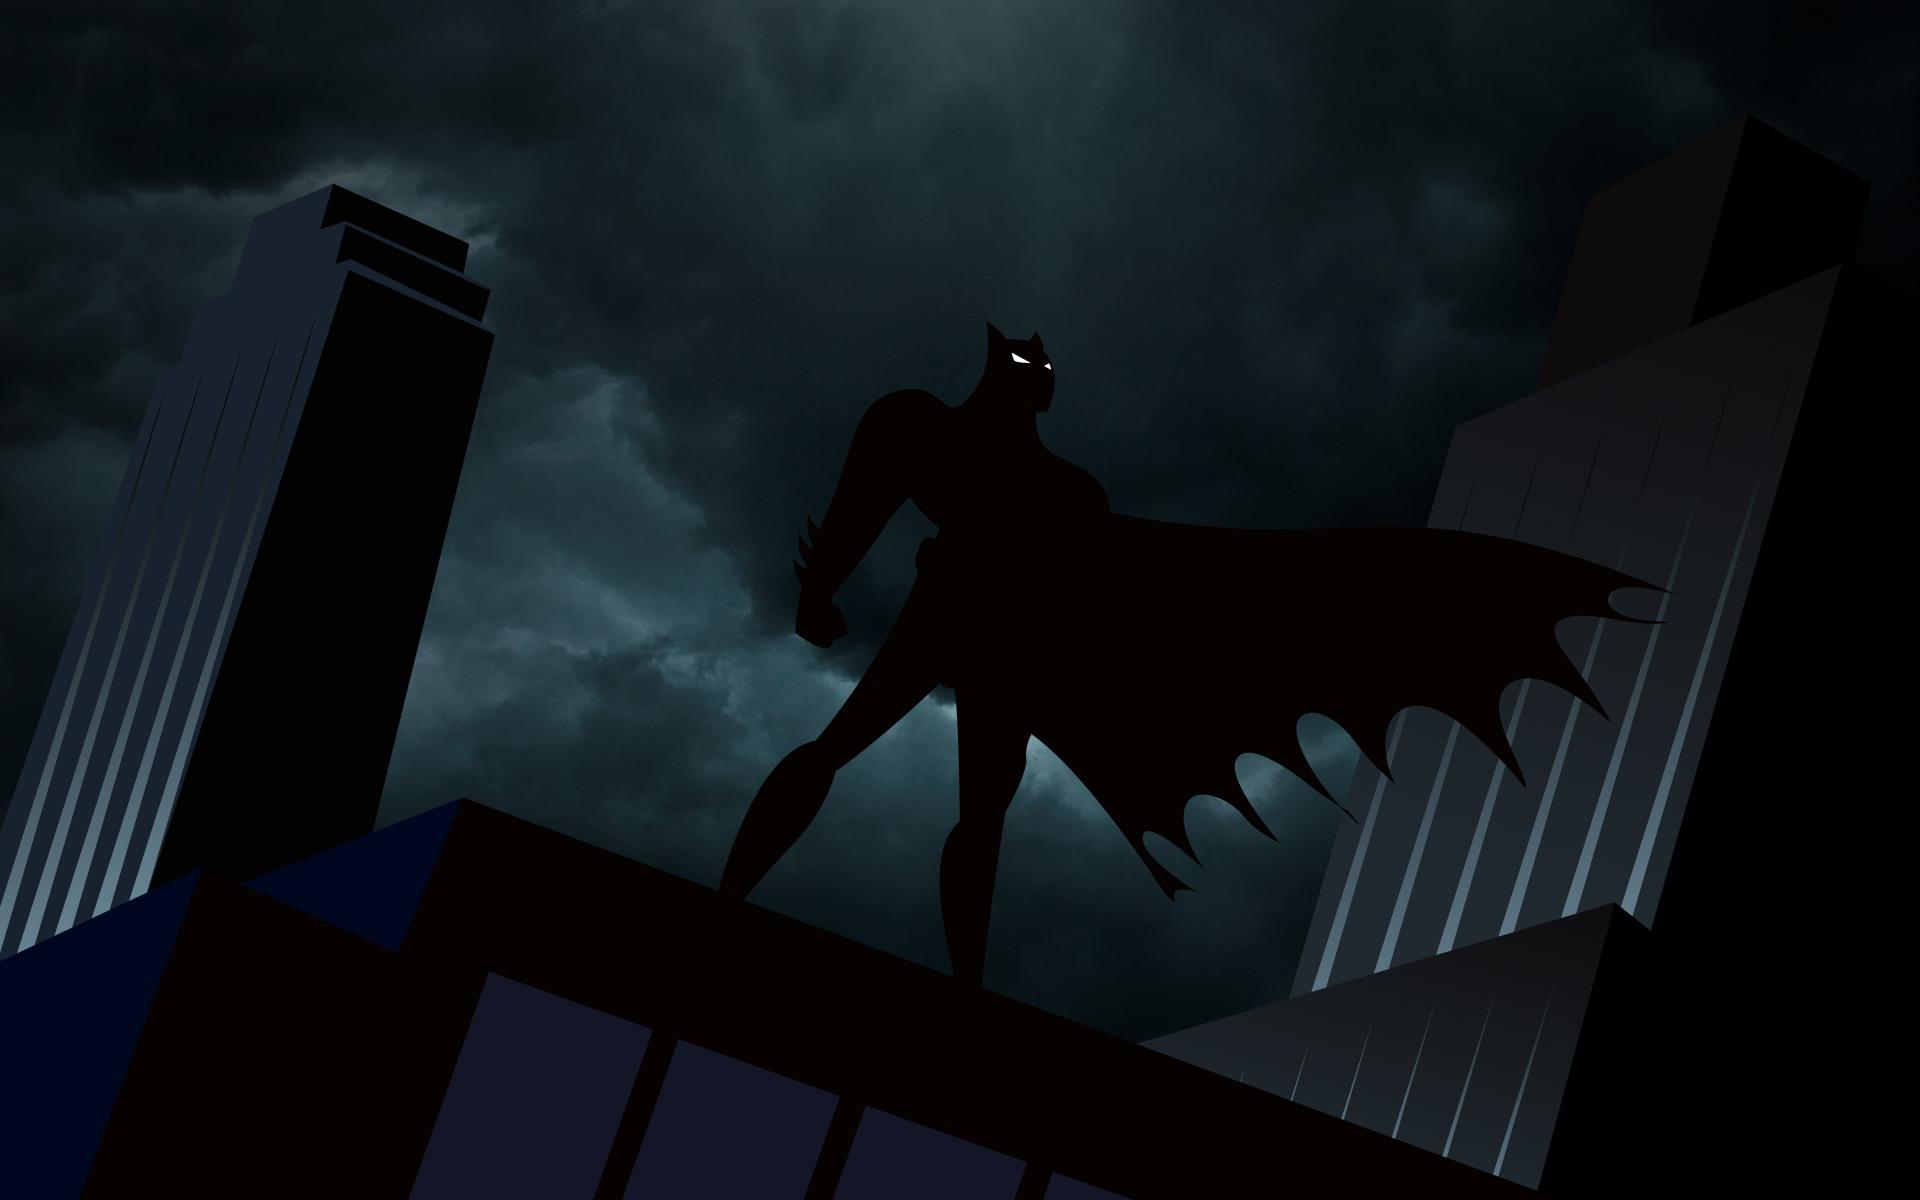 Batman The Animated Series desktop wallpaper 1920x1200